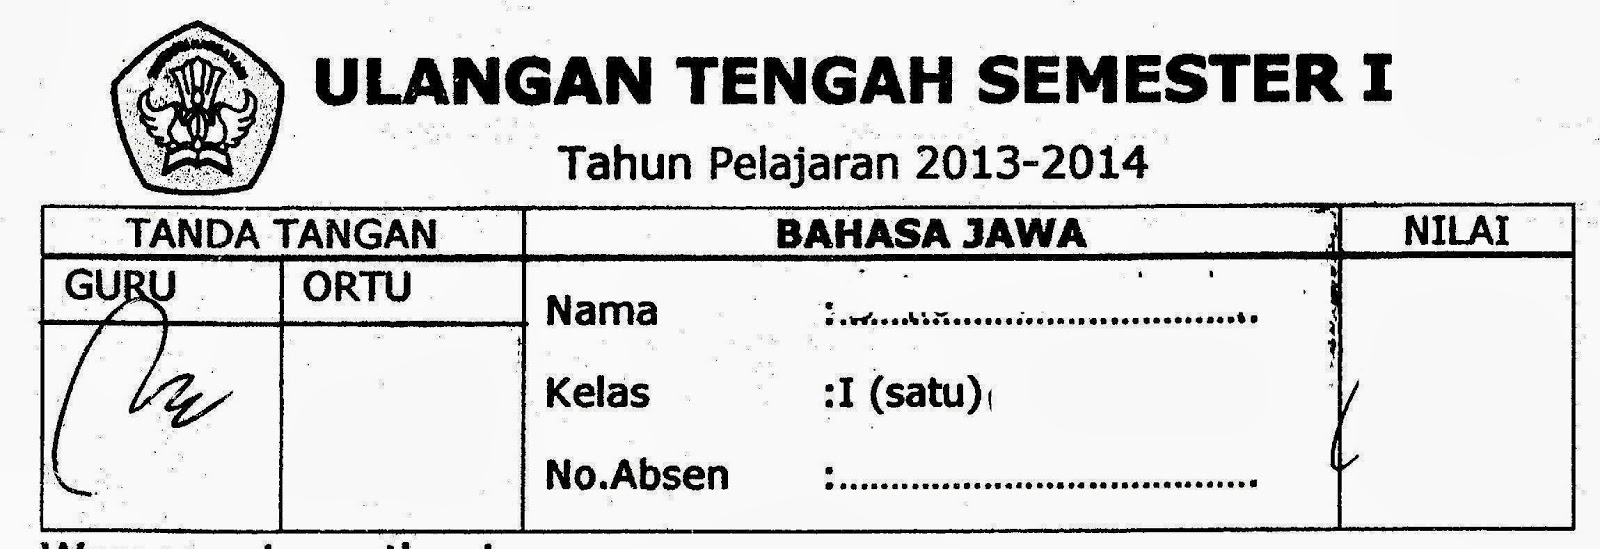 Ulangan Tengah Semester I Bhs Jawa Ta 2013 2014 Kurikulum 2013 Sunarto S Kom